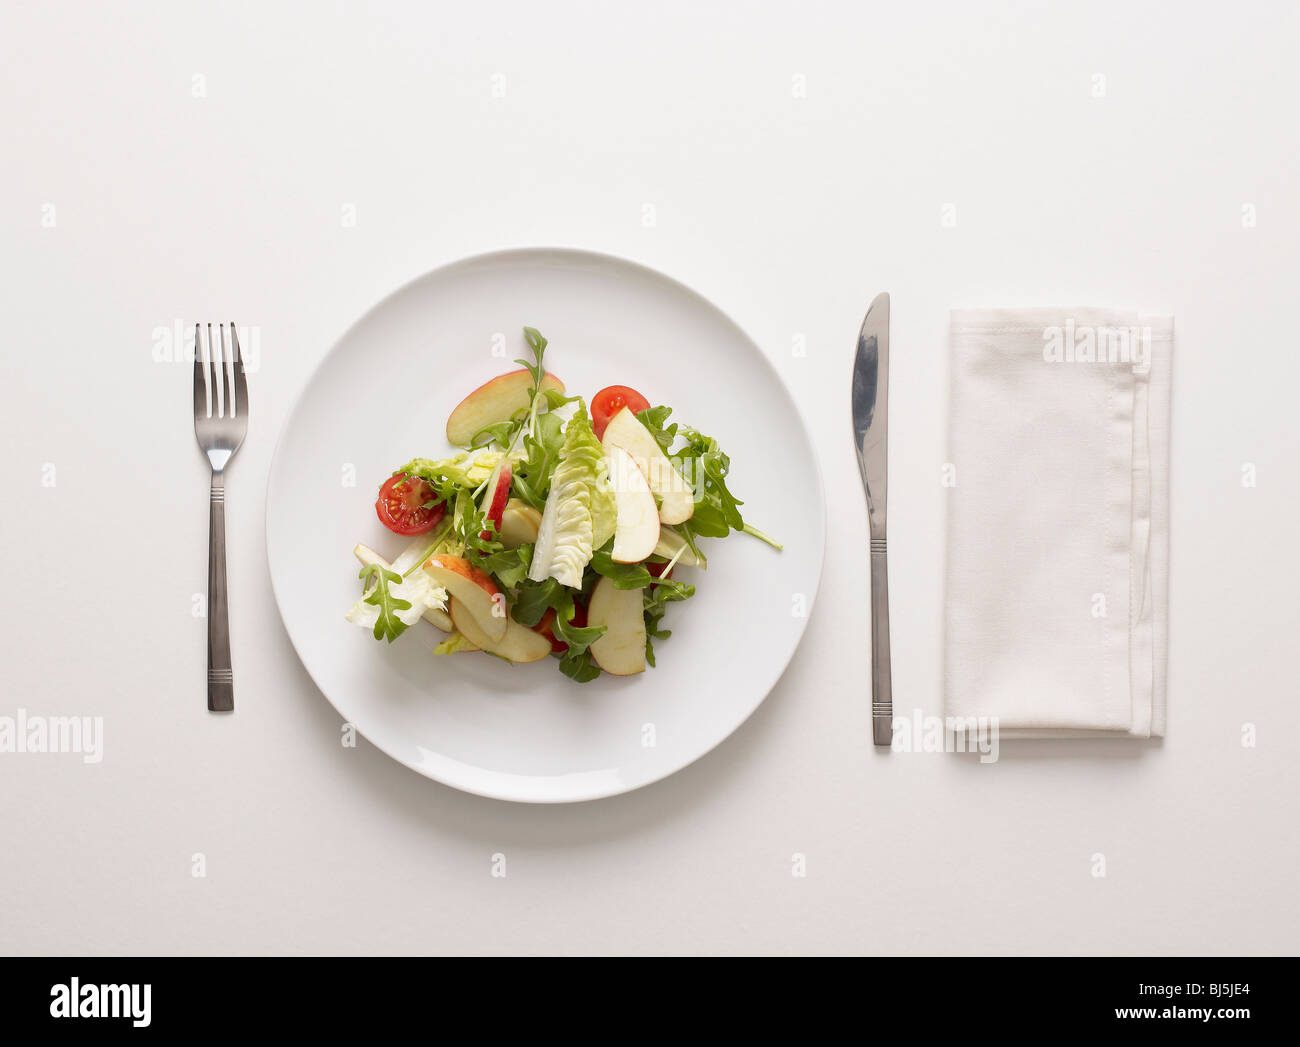 Un plato de ensalada Imagen De Stock